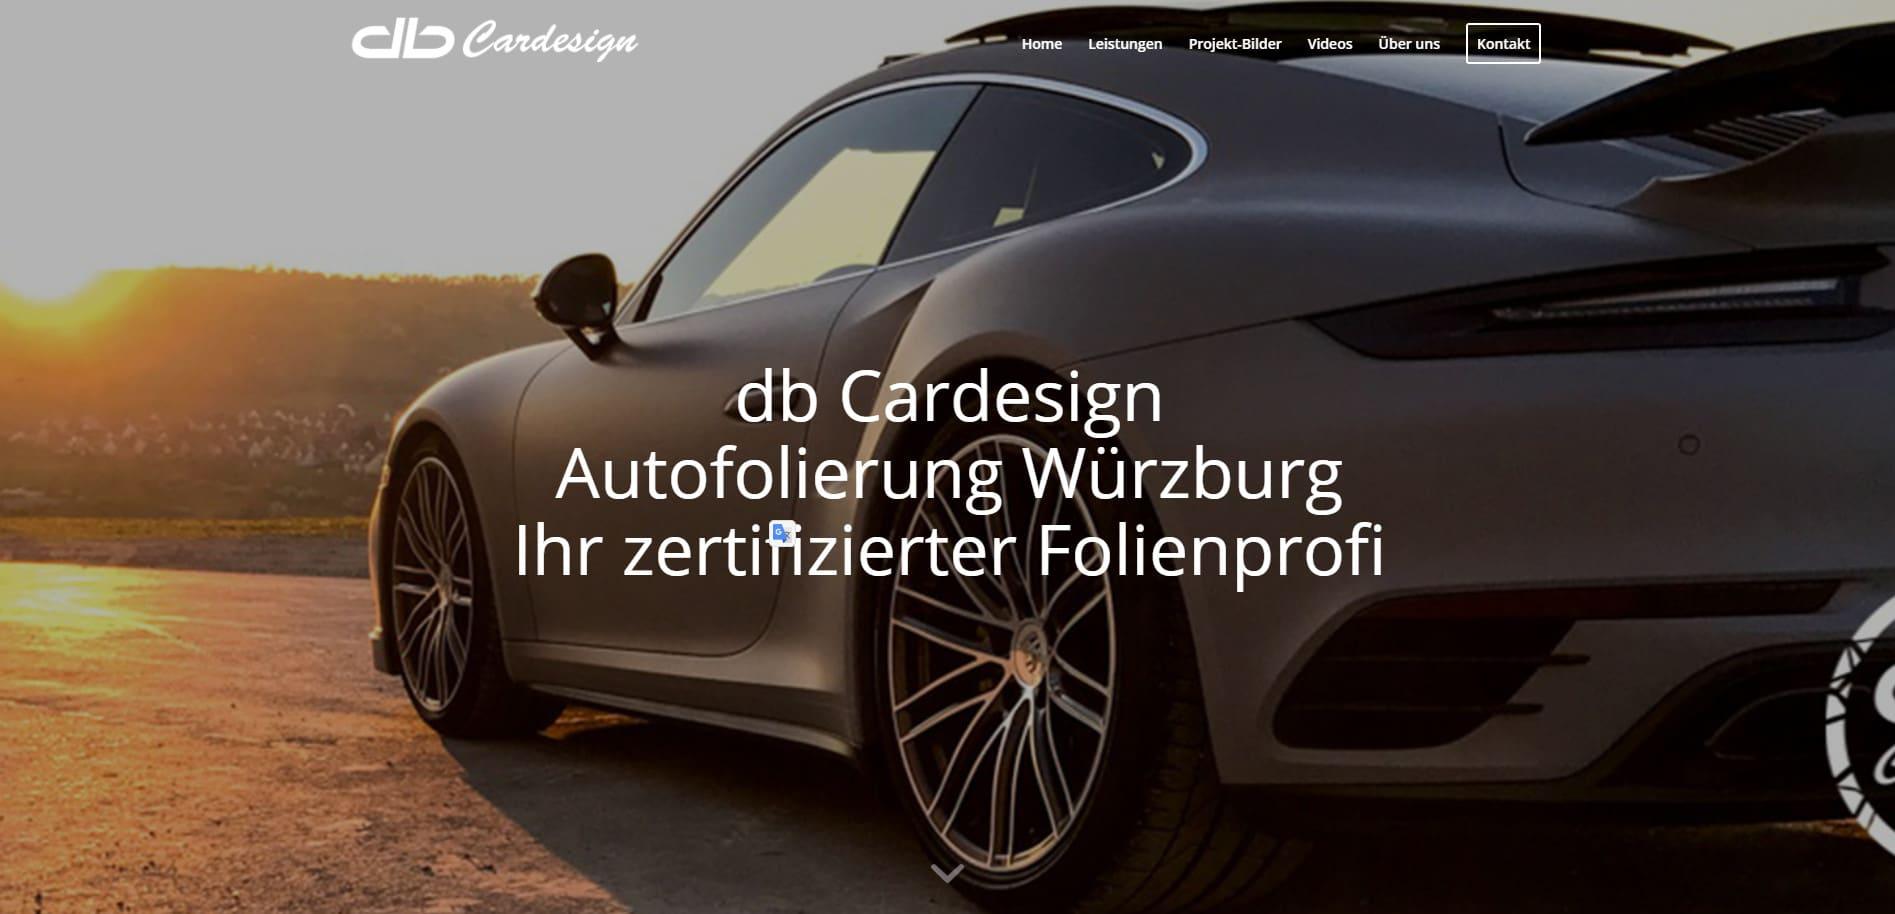 WordPress Website db Cardesign